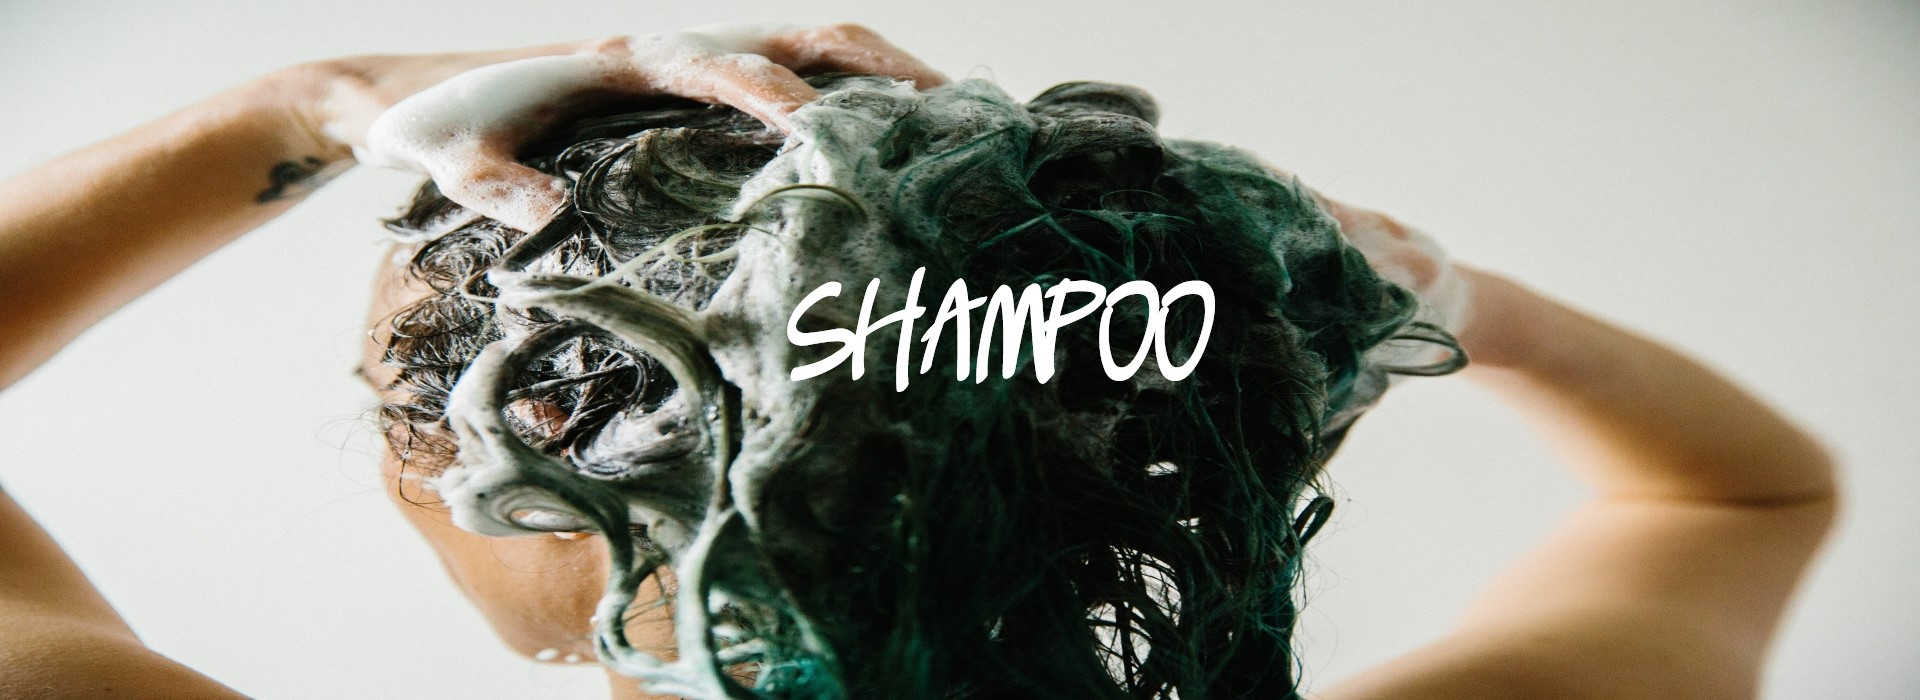 Shampoo Bars and Liquid